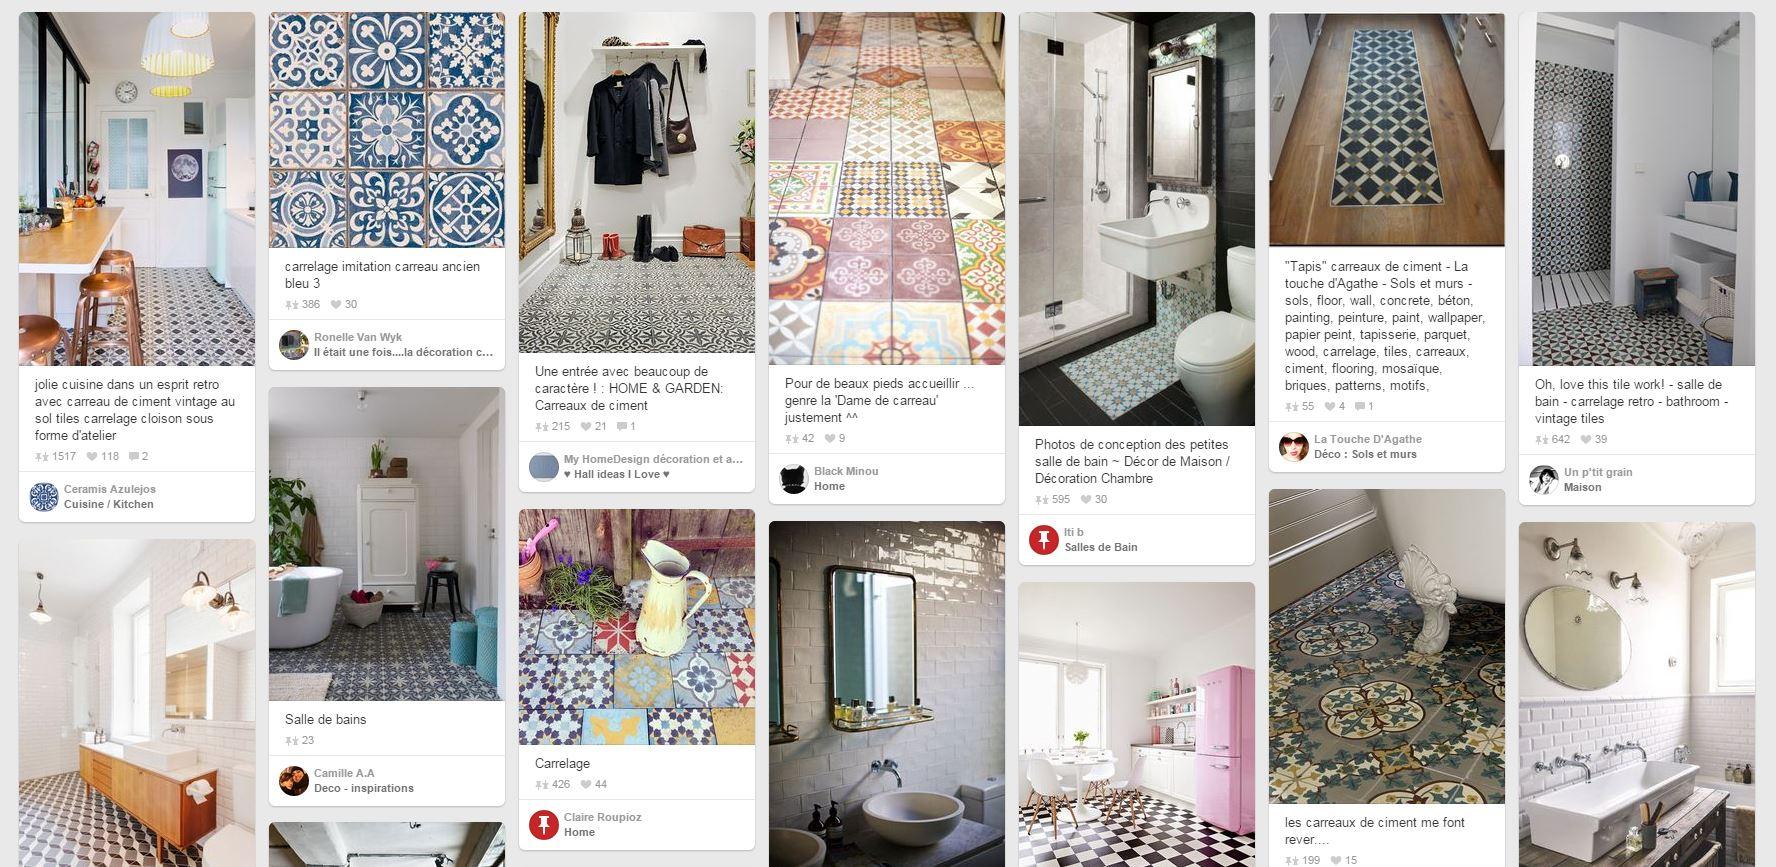 Tapis Imitation Carreaux De Ciment Vinyle tapis floorart | enredada